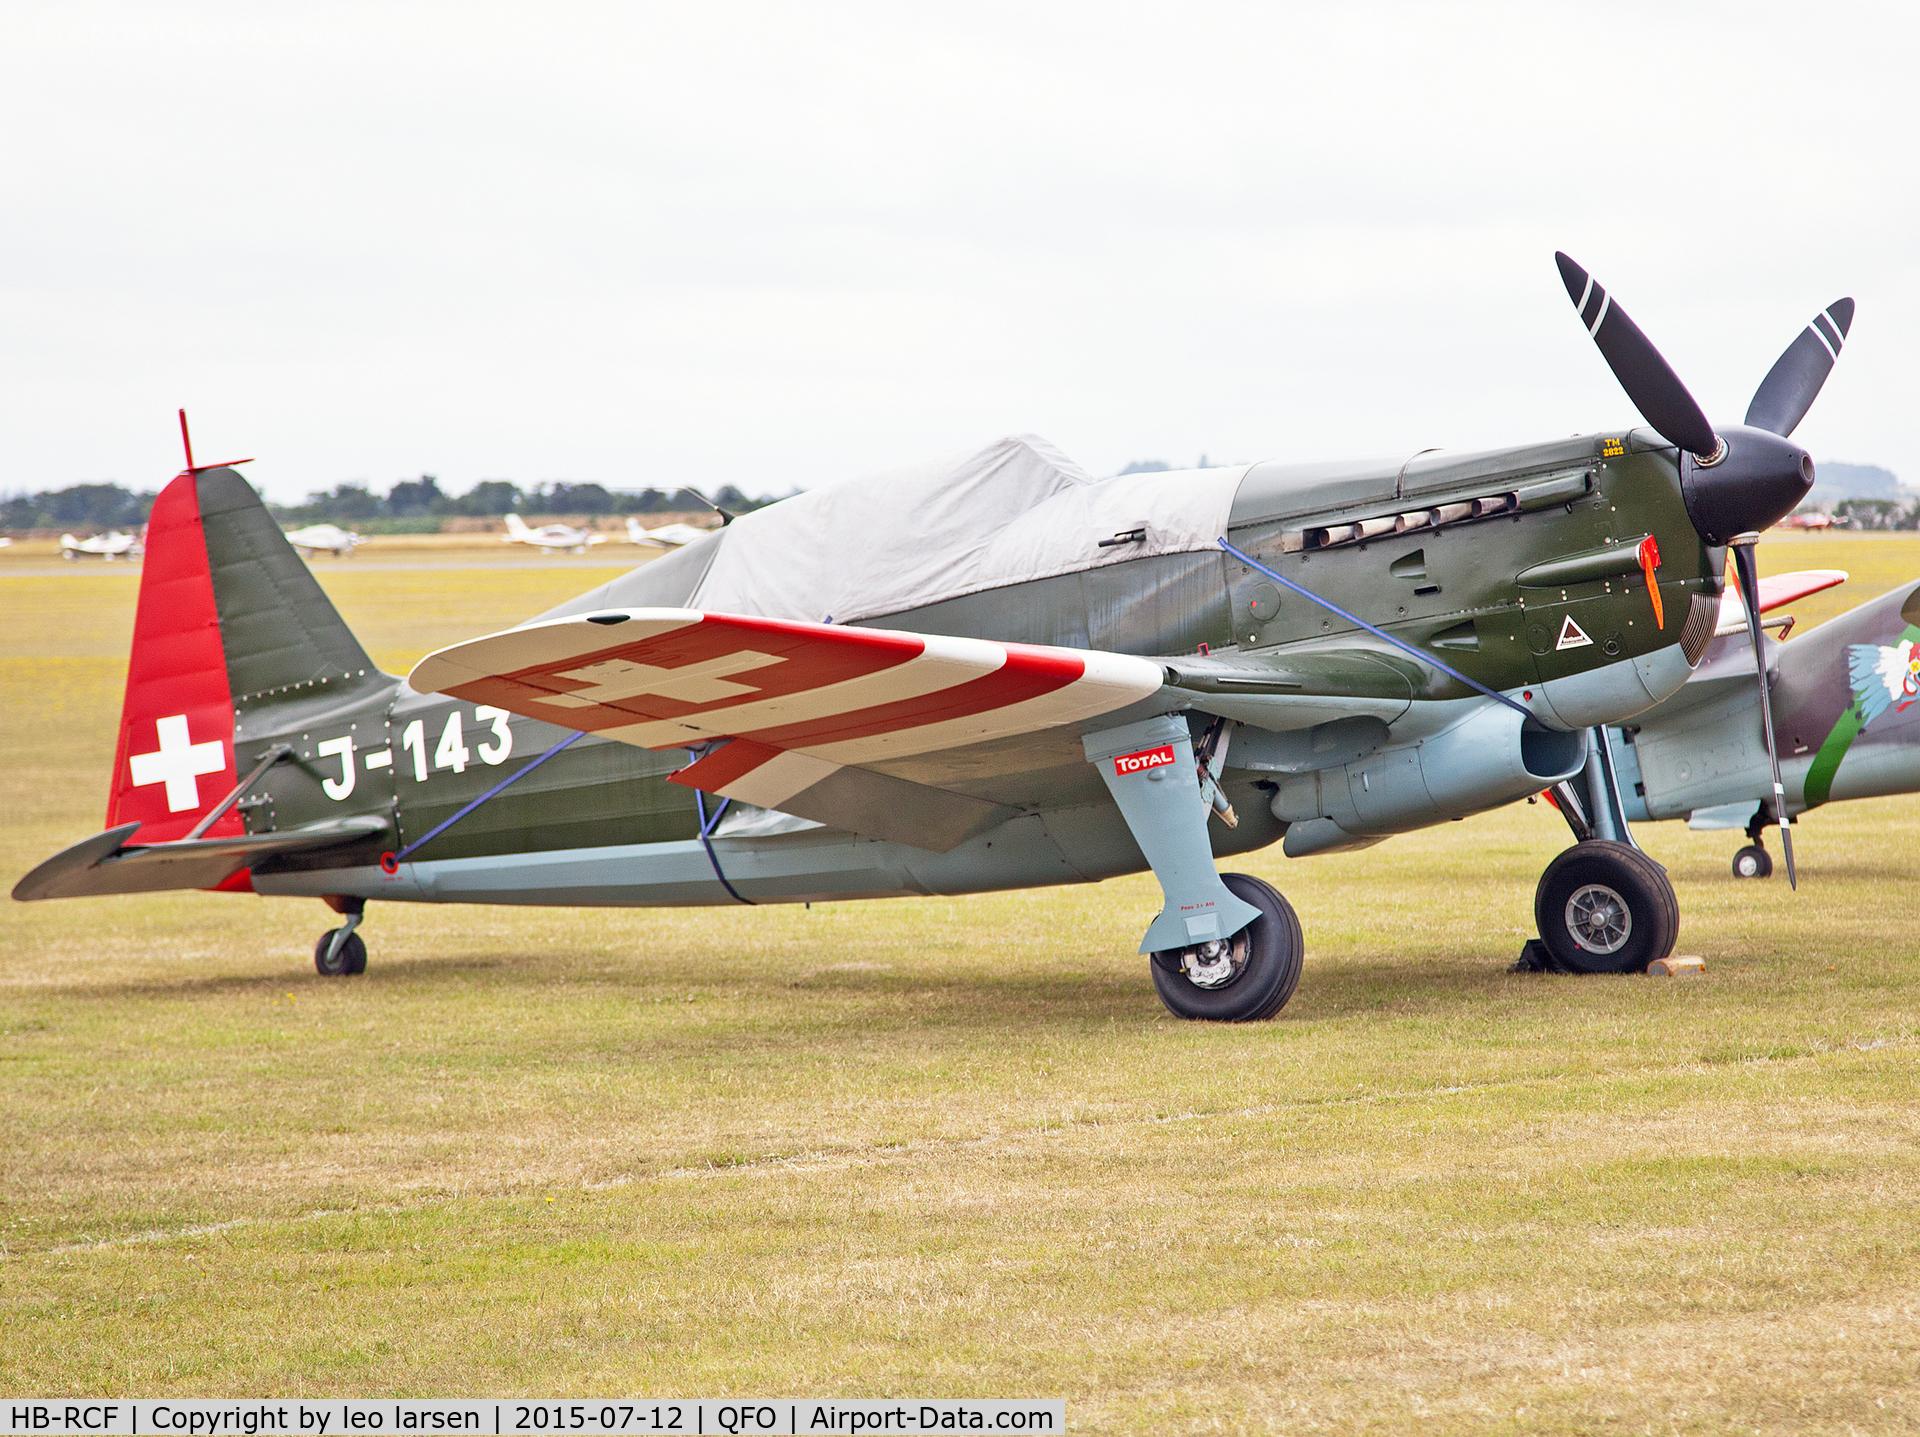 HB-RCF, 1942 Morane-Saulnier (EKW) D-3801 (MS-412) C/N 194, Duxford 12.7.2015